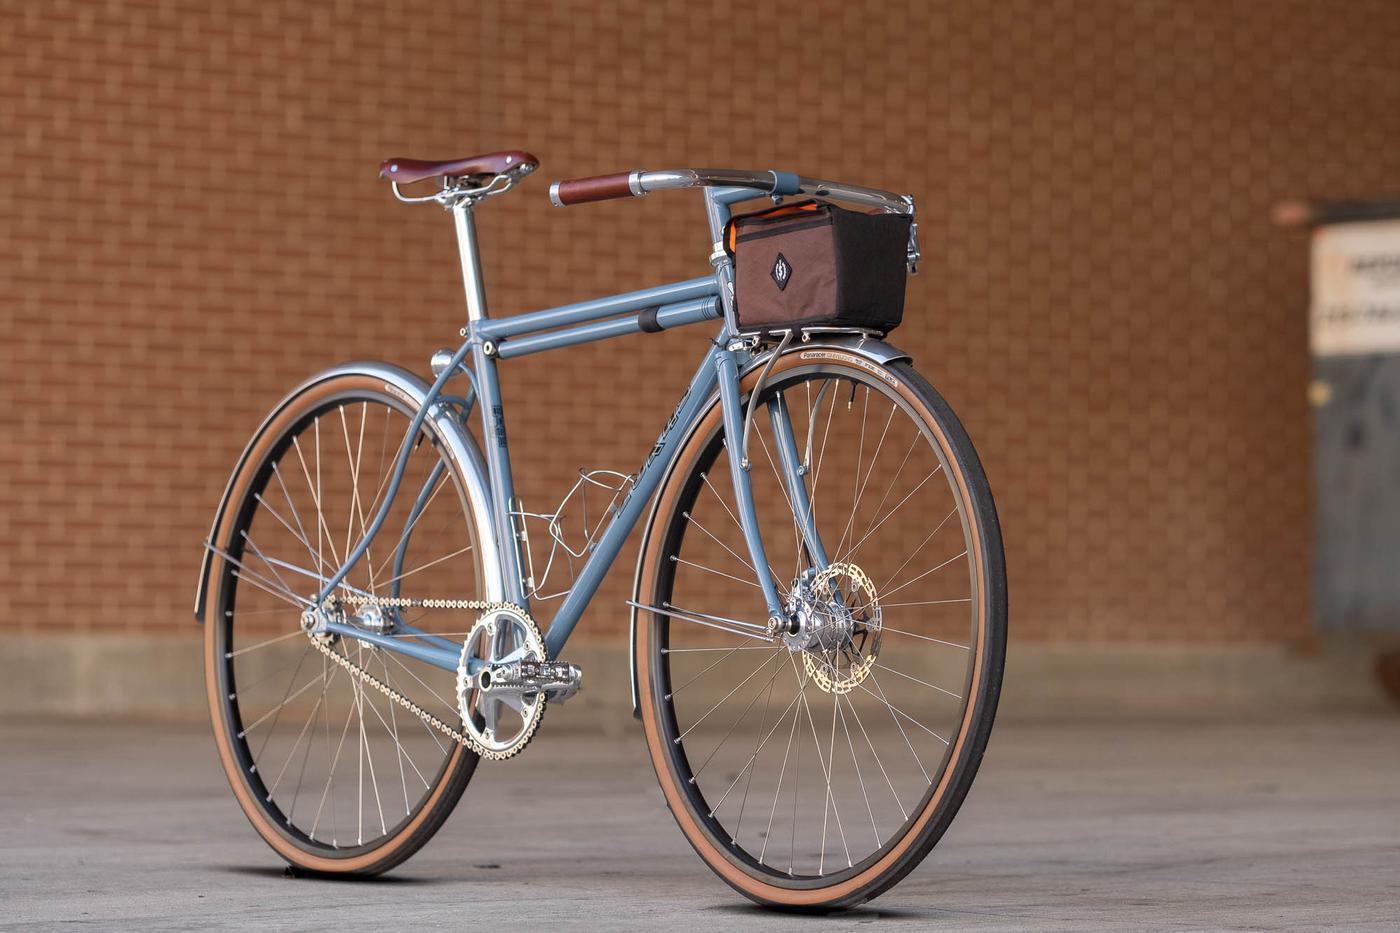 Philly Bike Expo: Zukas Cycles City Singlespeed